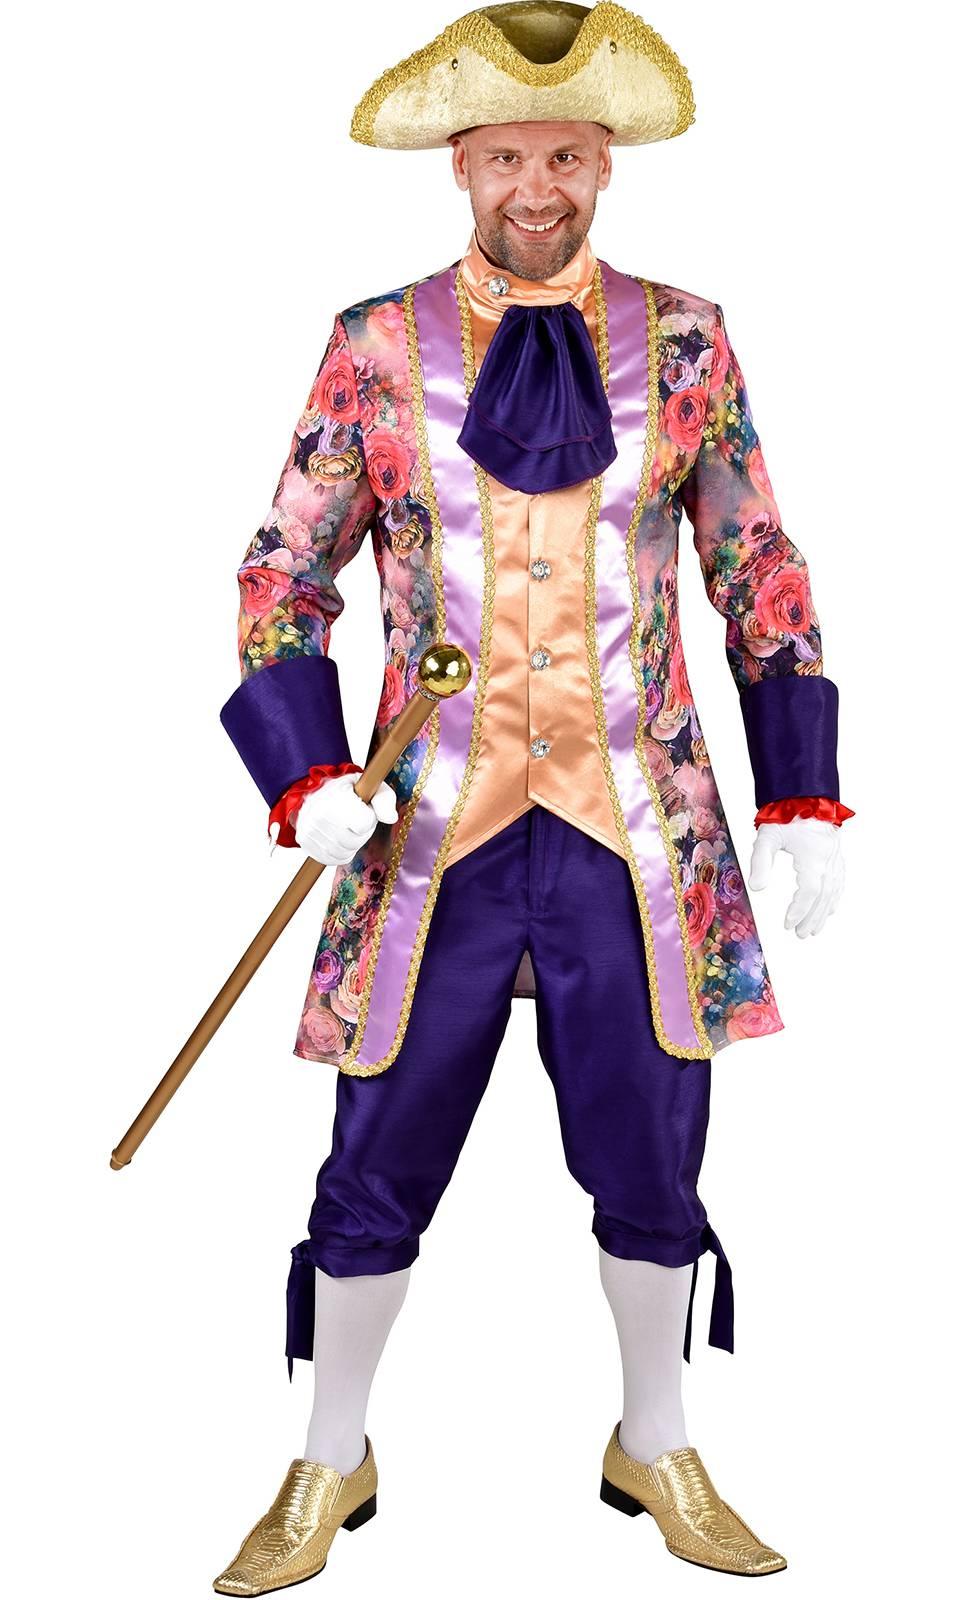 Costume de marquis versailles xl - xxl